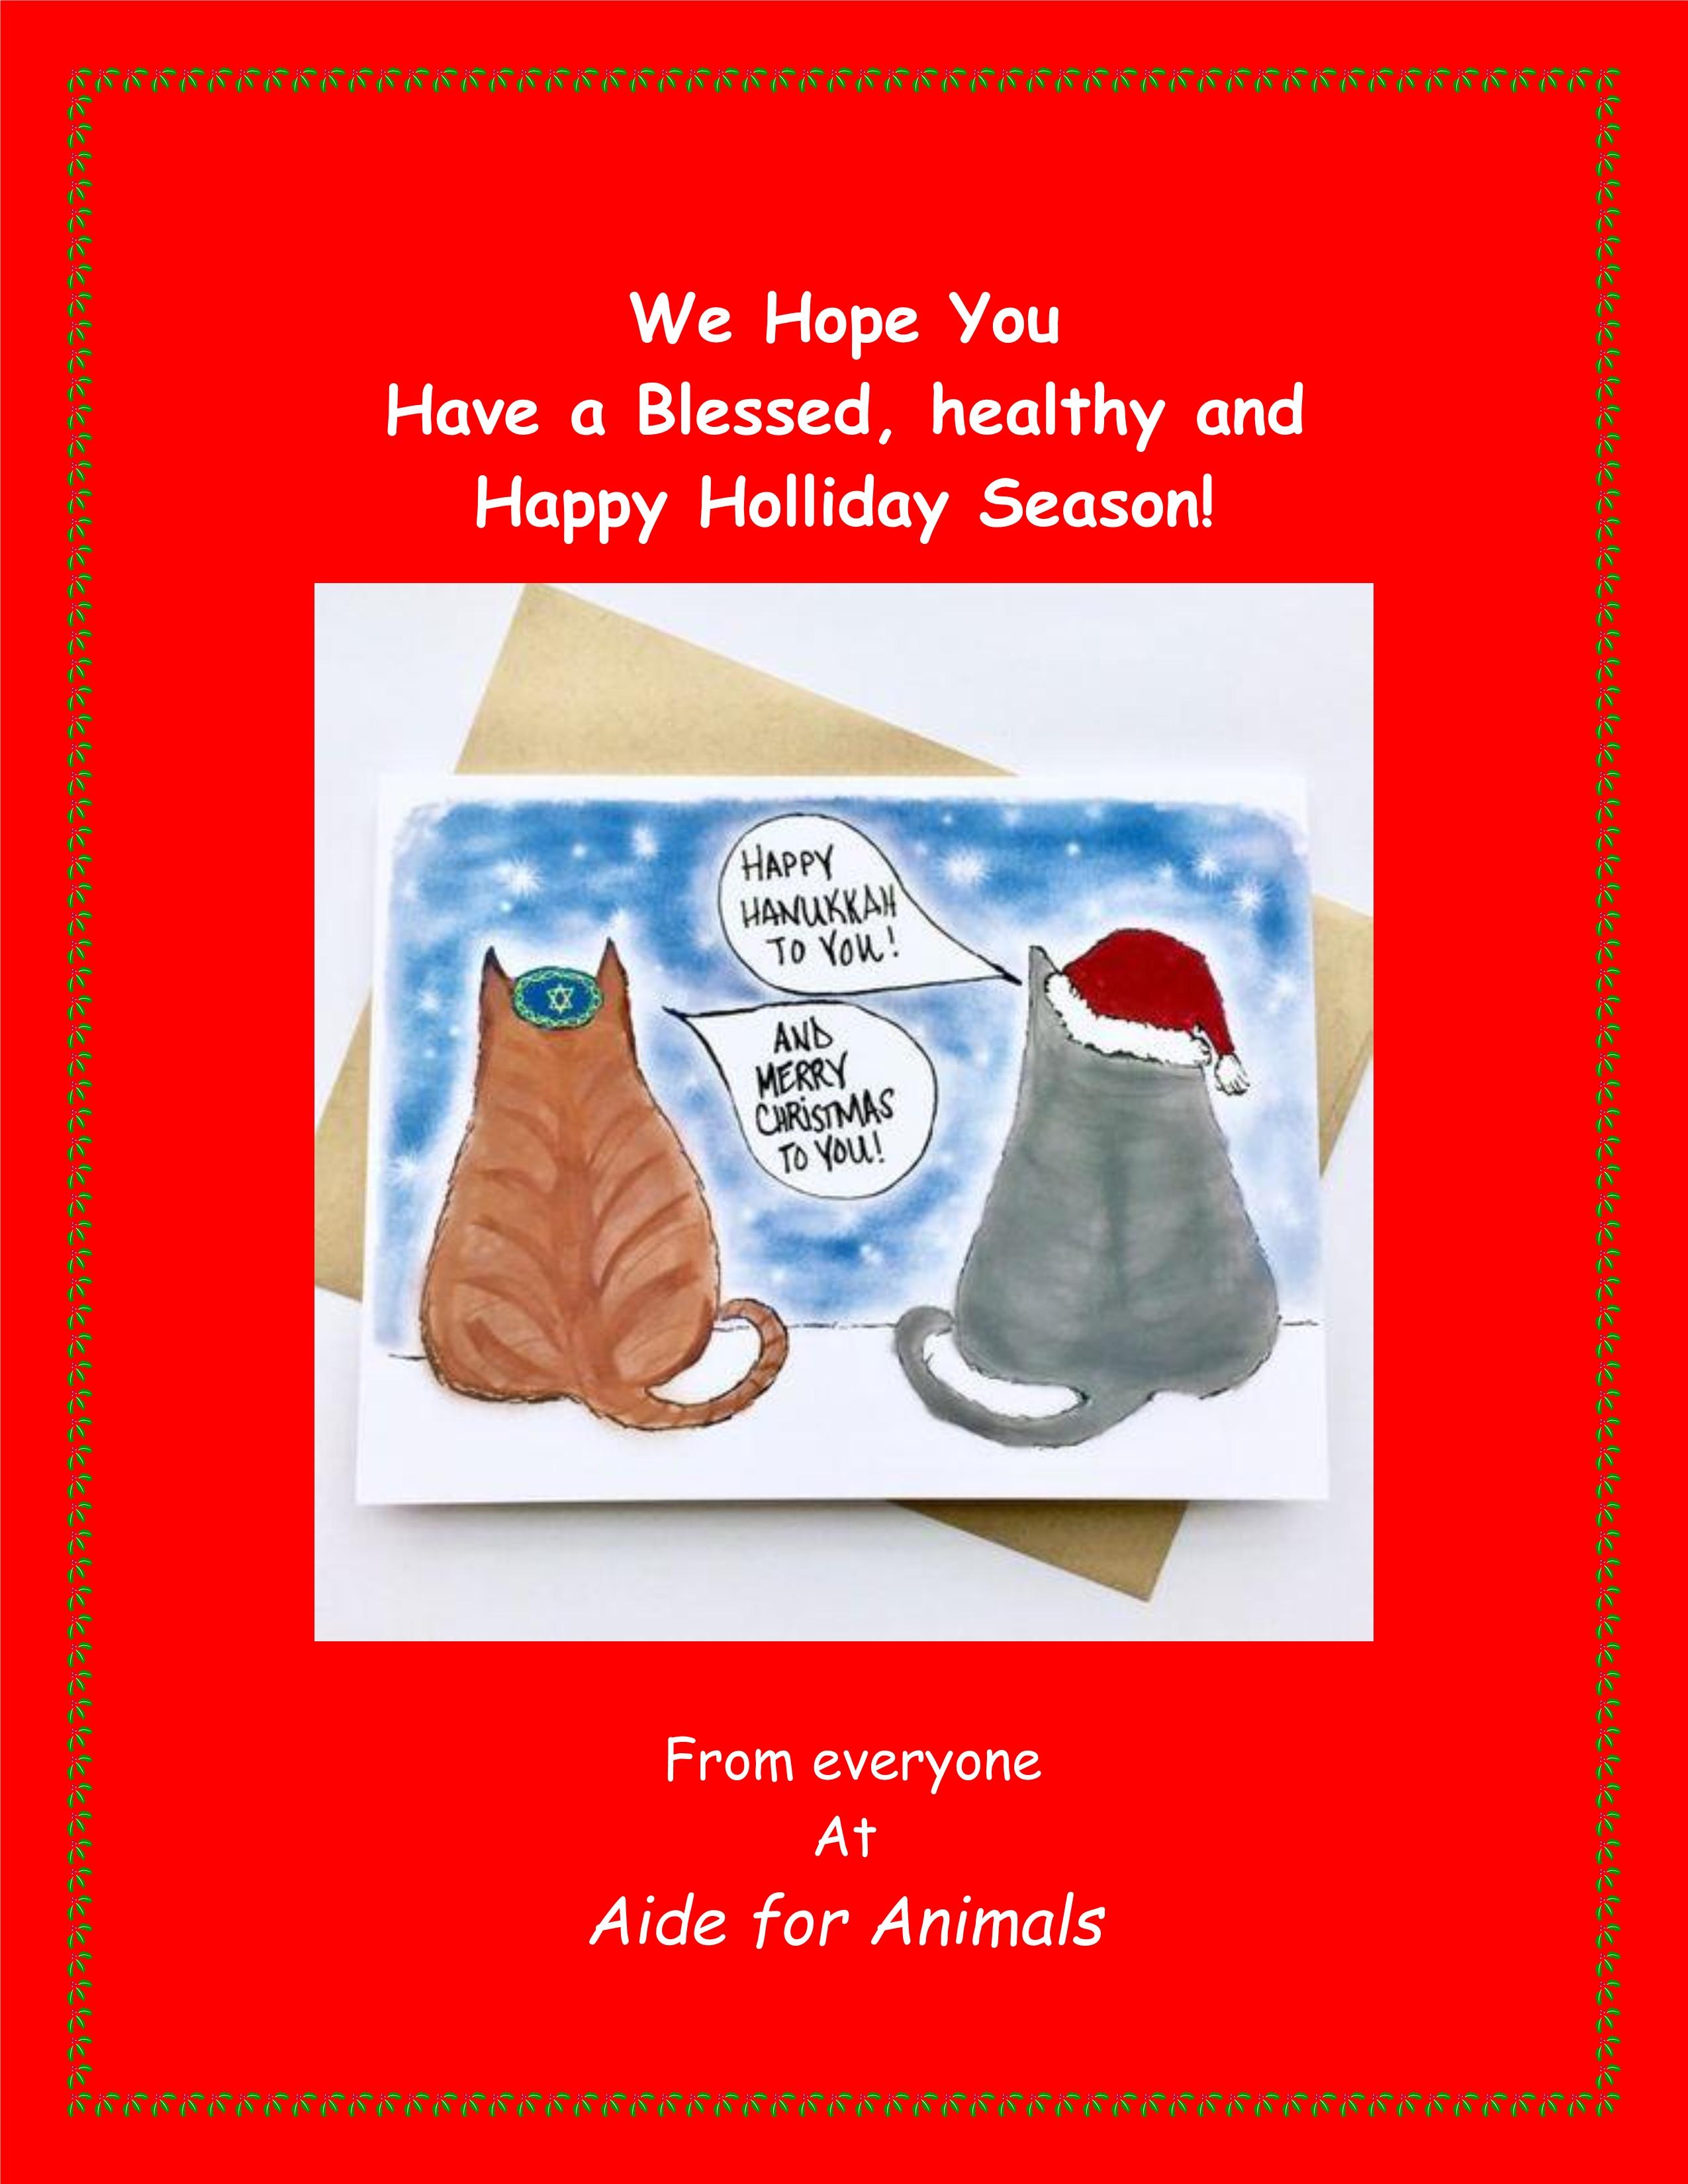 Merry Christmas & Happy Hanukkah